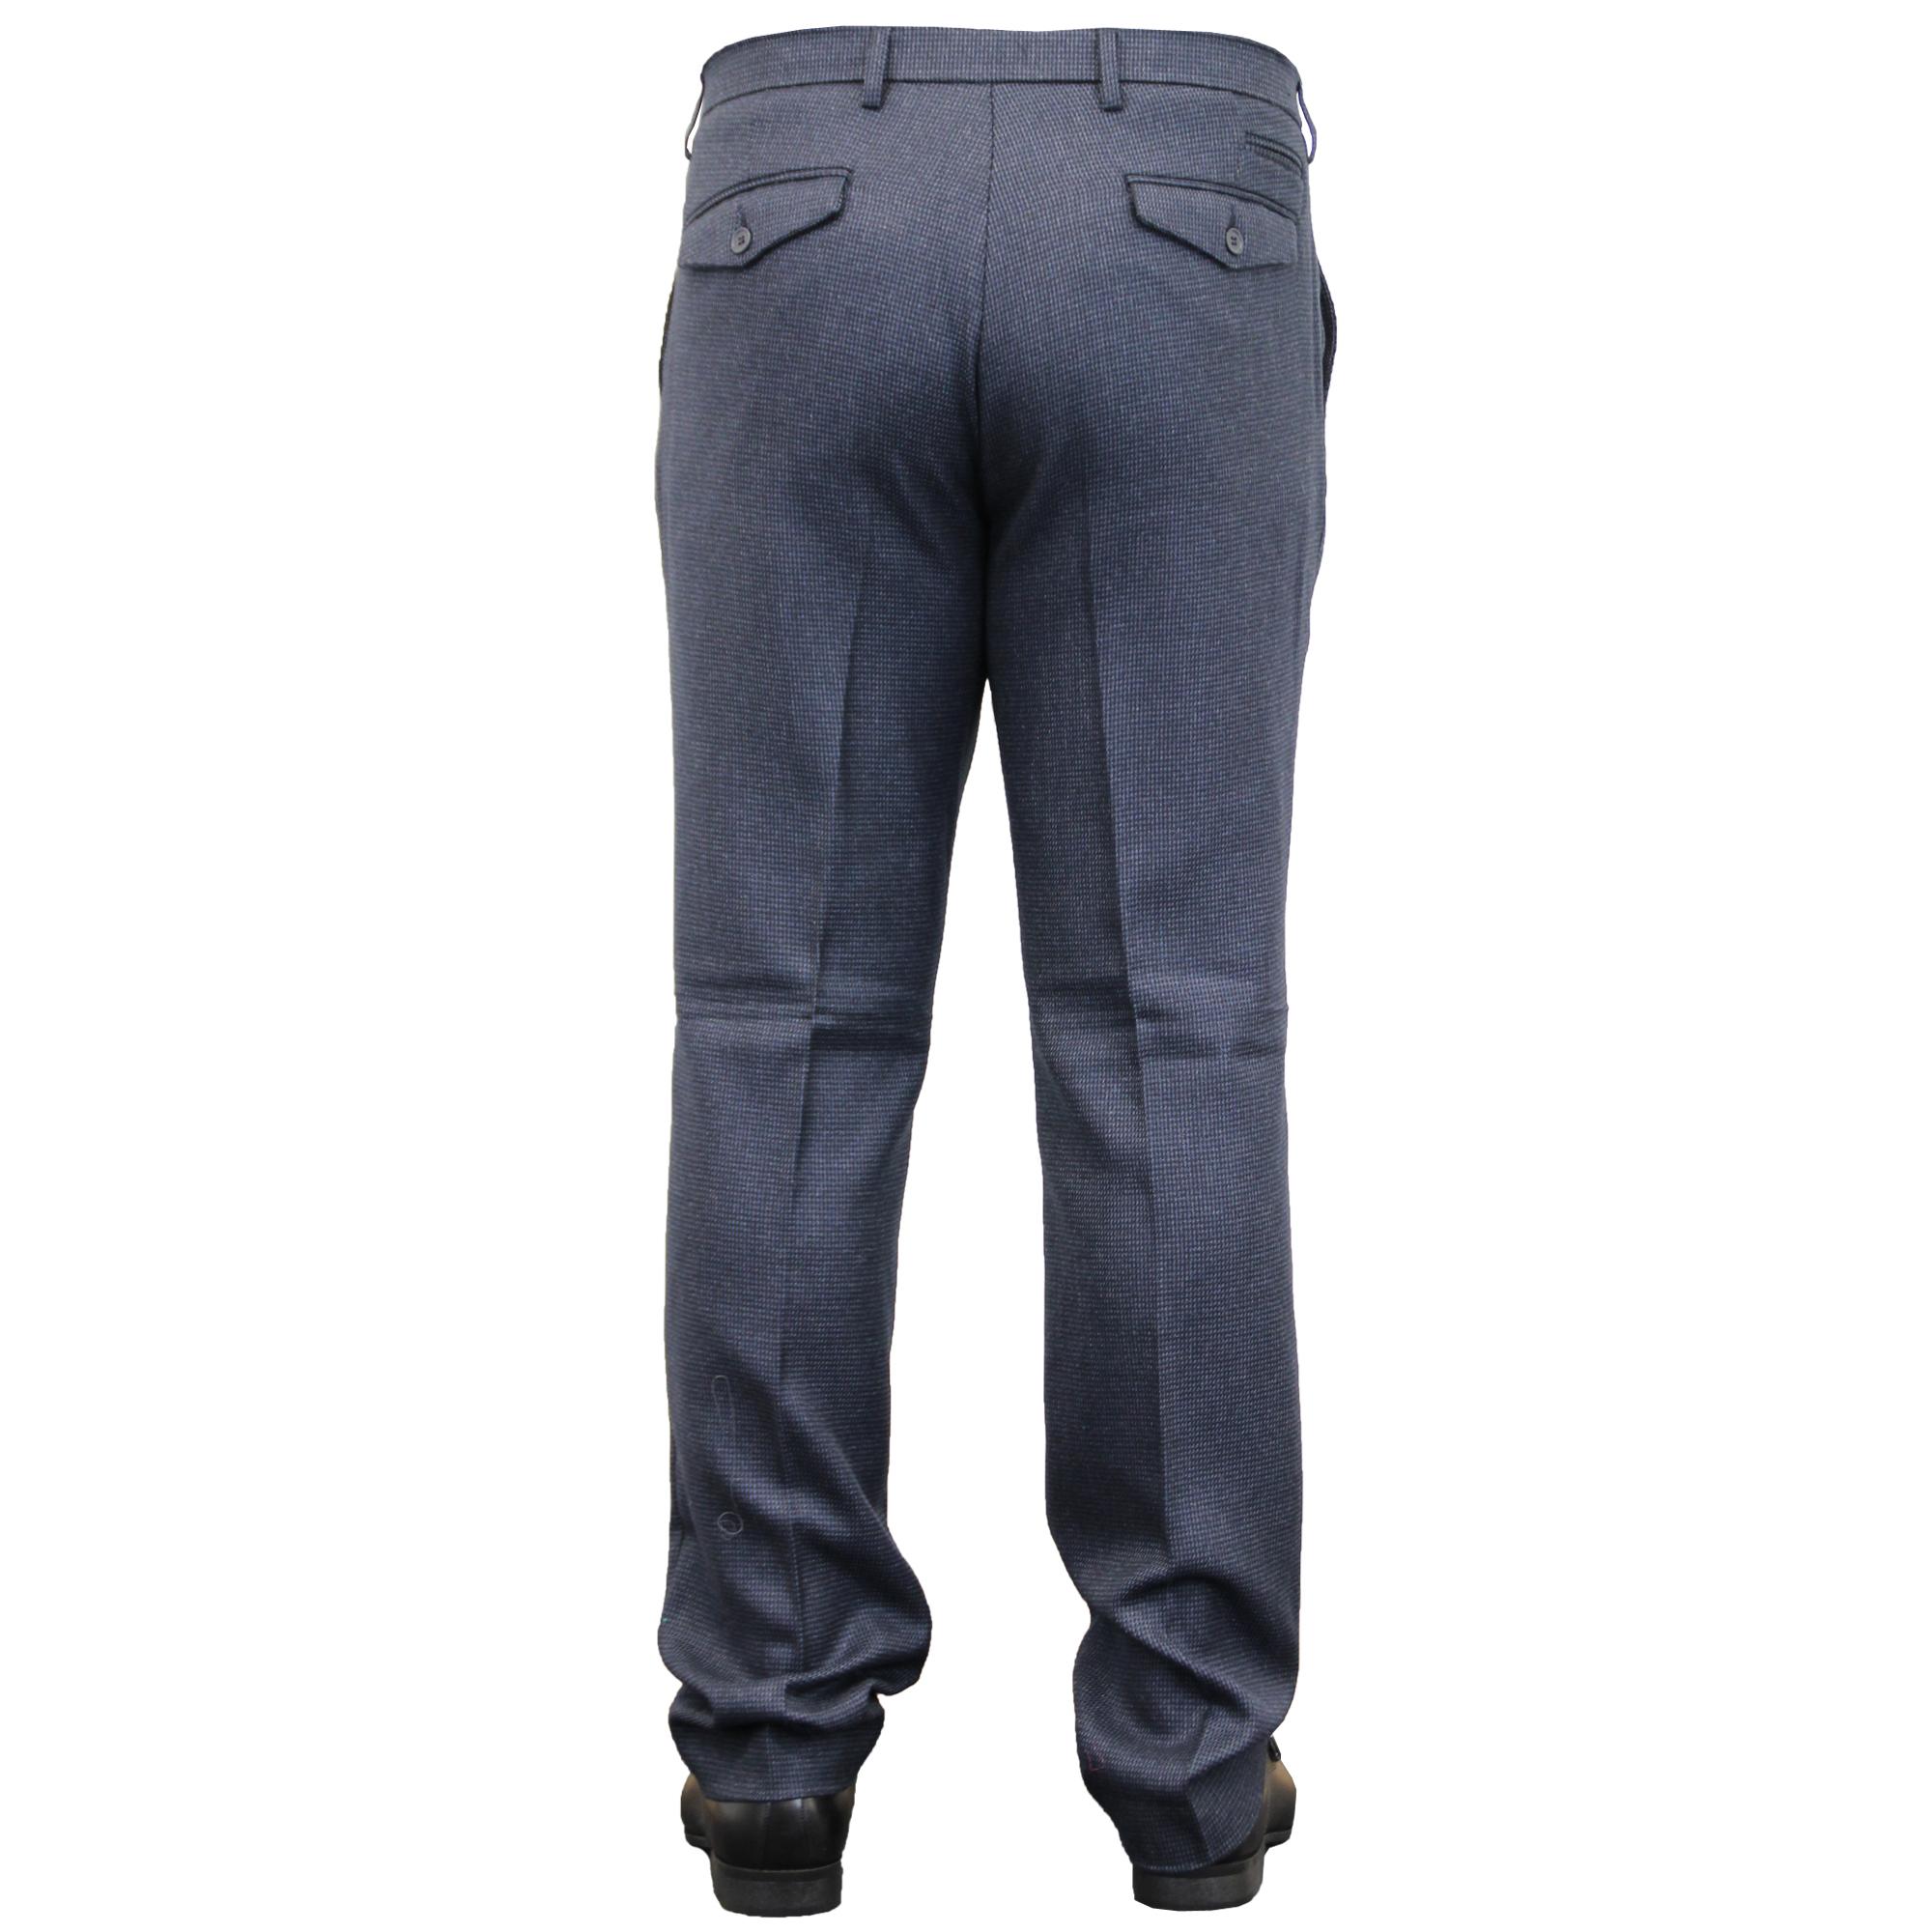 Mens-Trouser-Cavani-Pants-Formal-Wedding-Office-Work-Smart-Fashion-Casual-New thumbnail 5